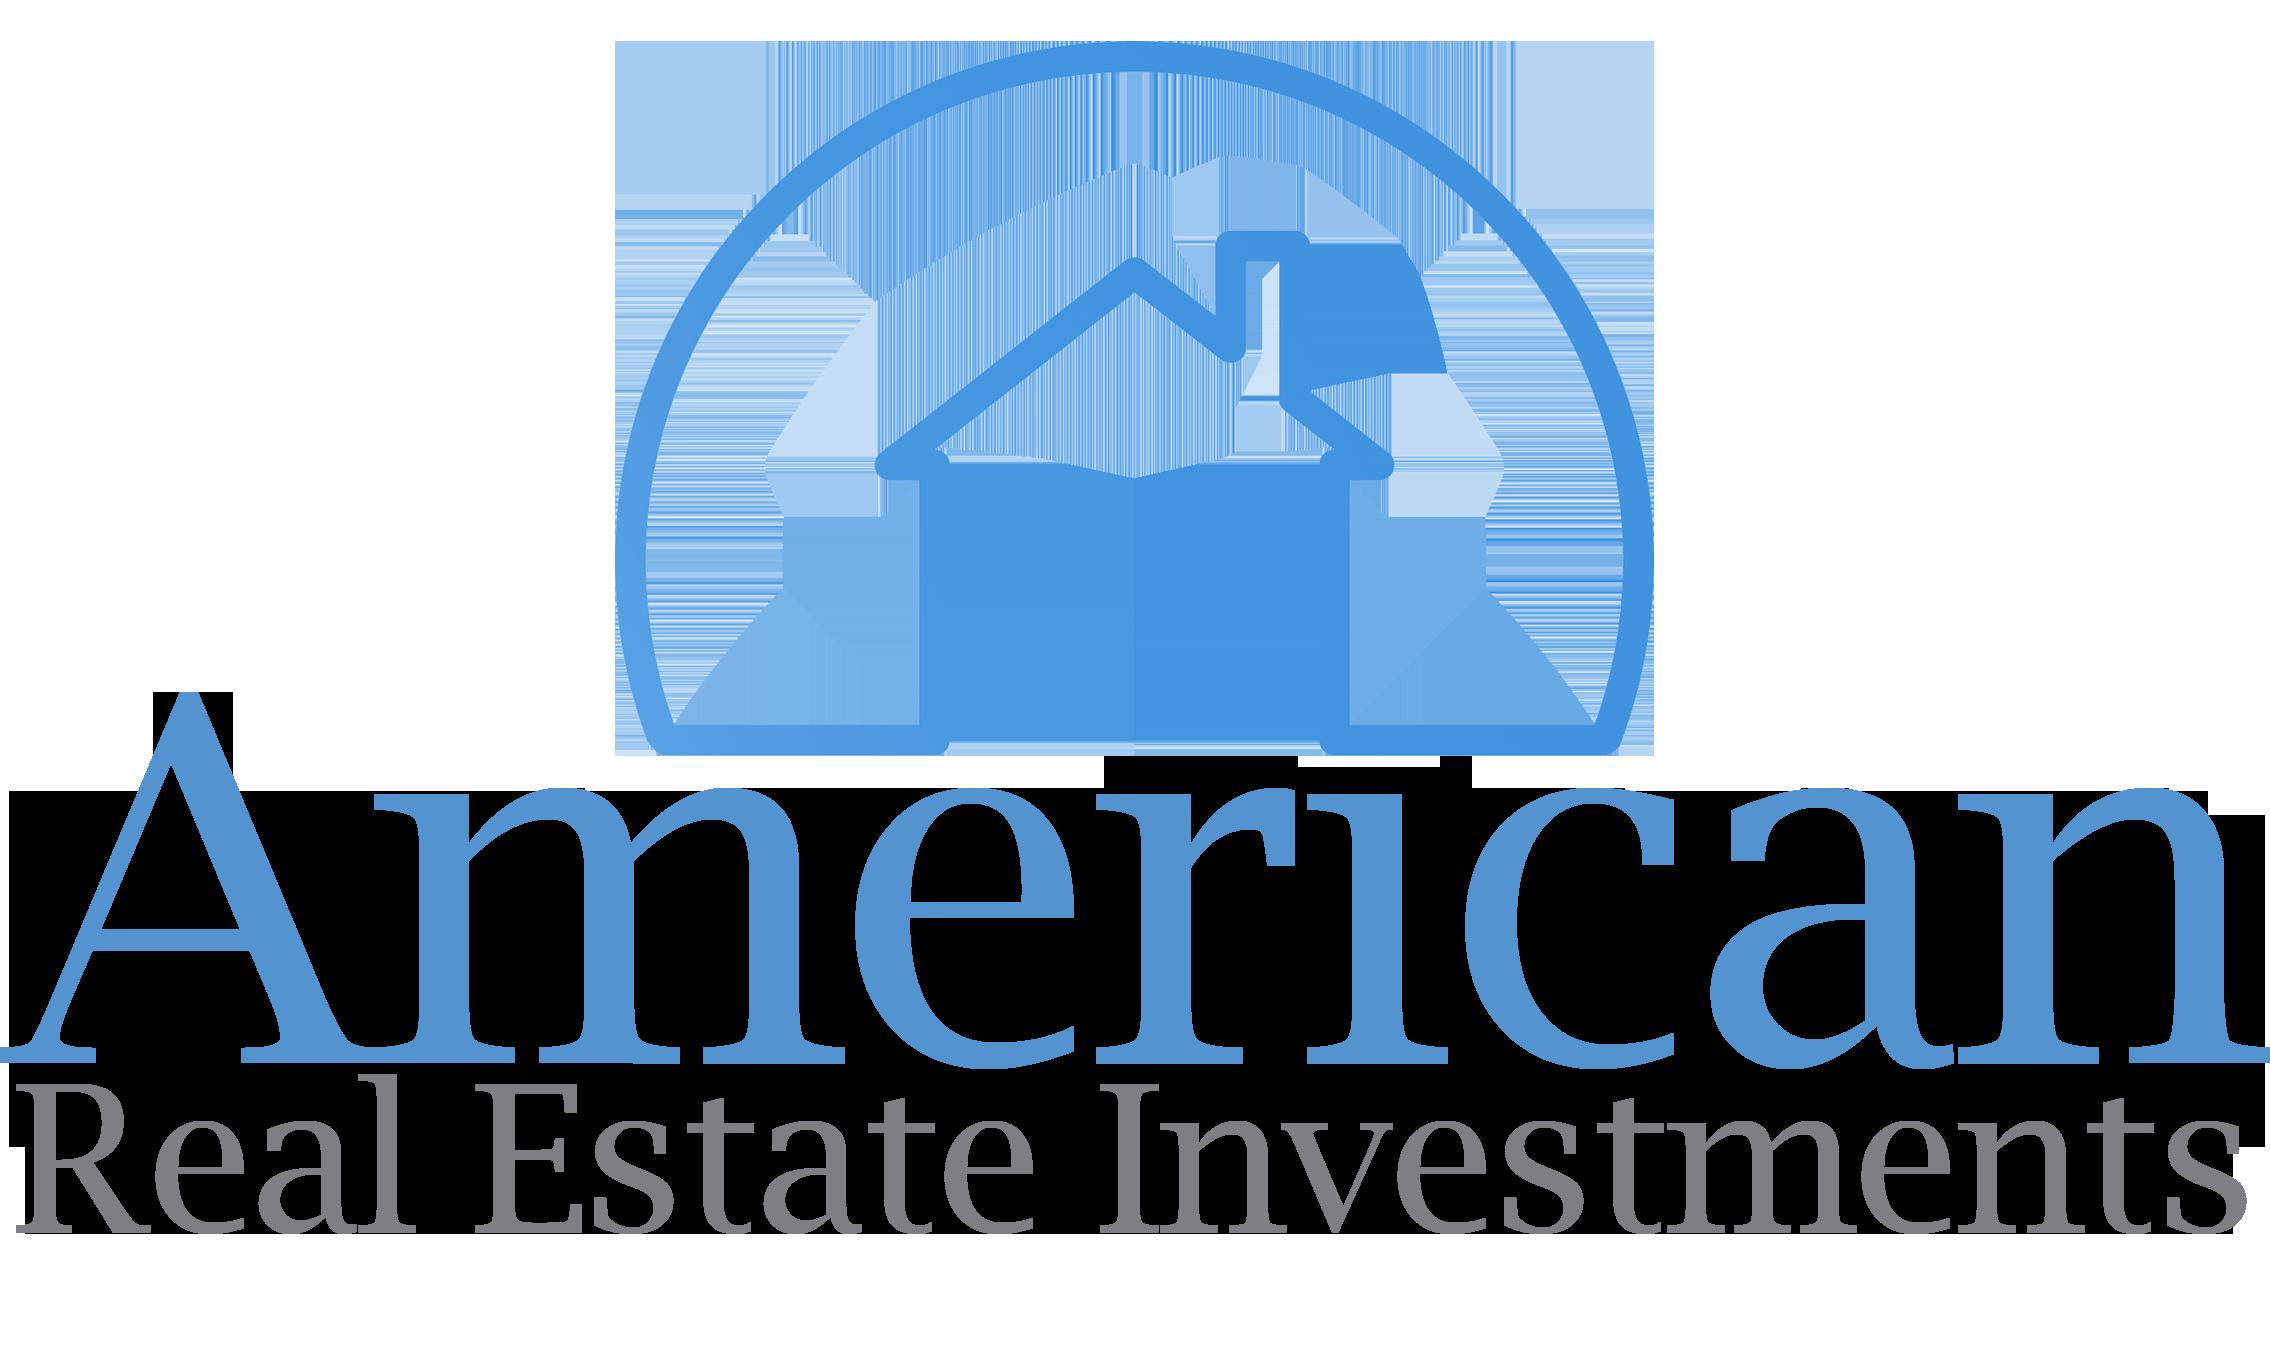 Schroder Real Estate Net Asset Value Declines But Outperforms Benchmark